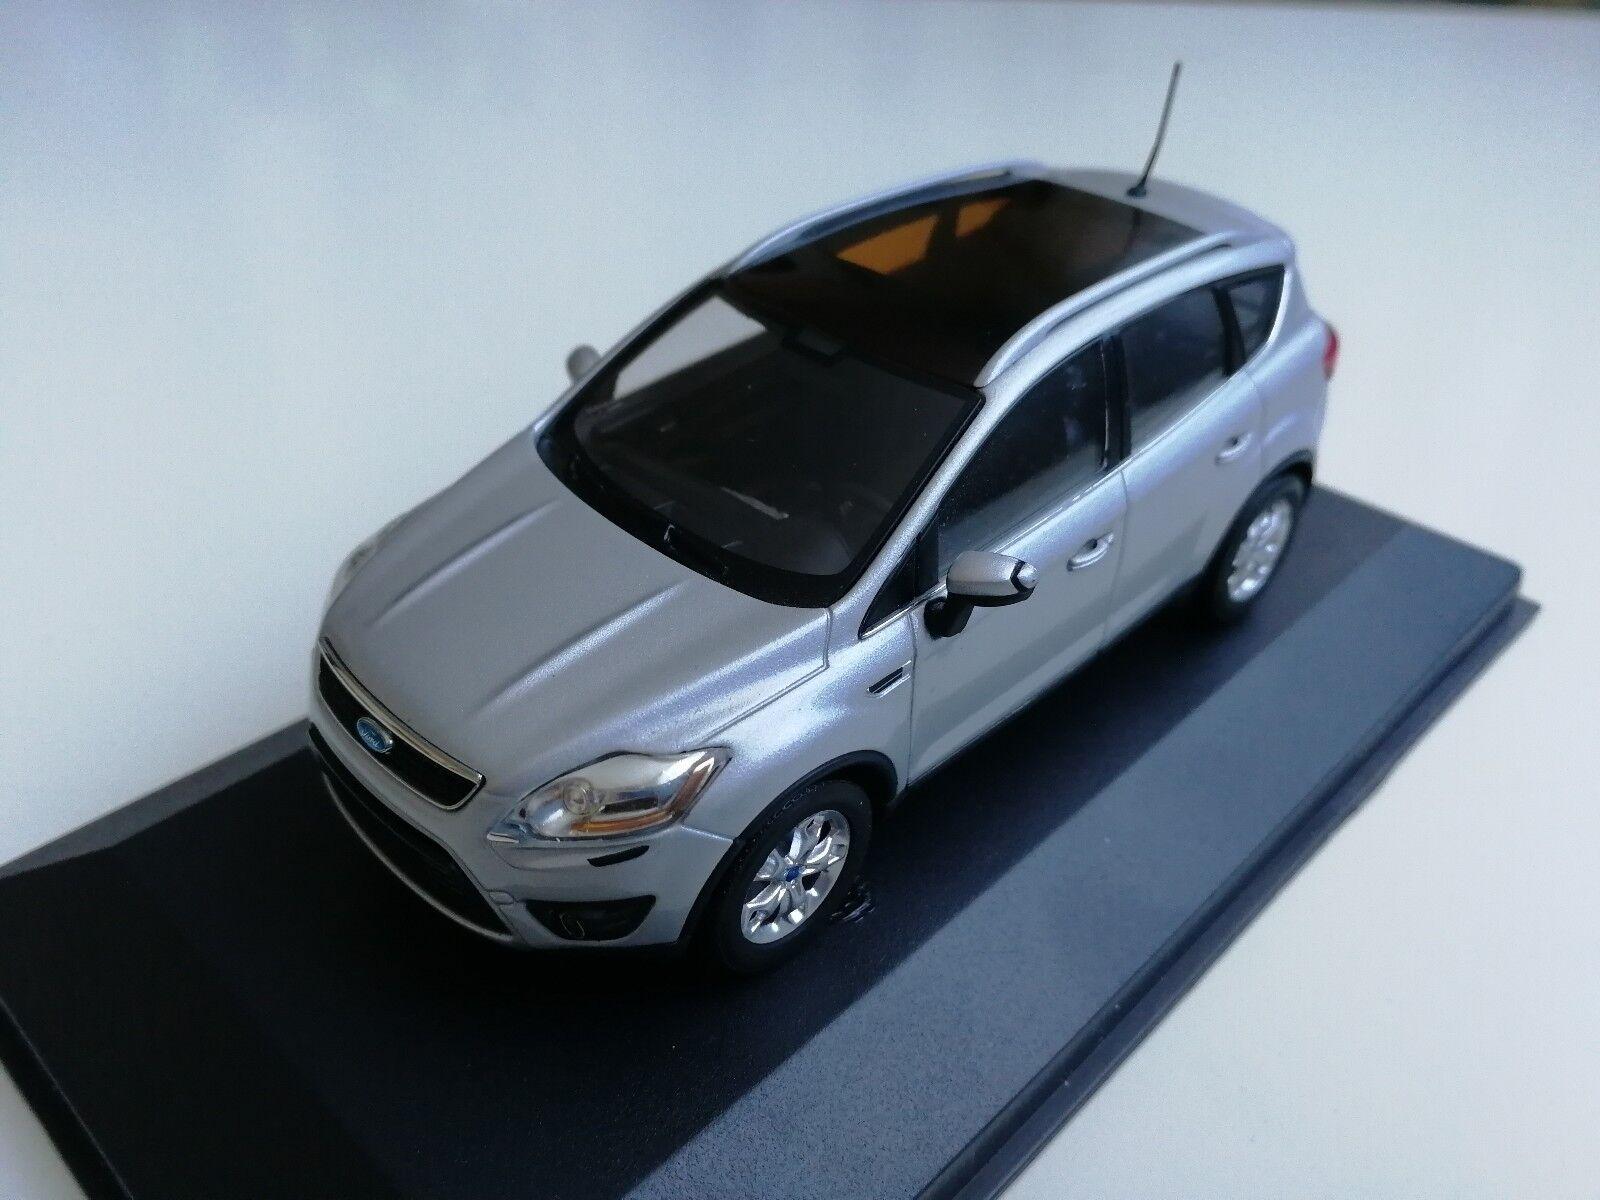 Ford Kuga 2008-11 silver (Minichamps) 1 43